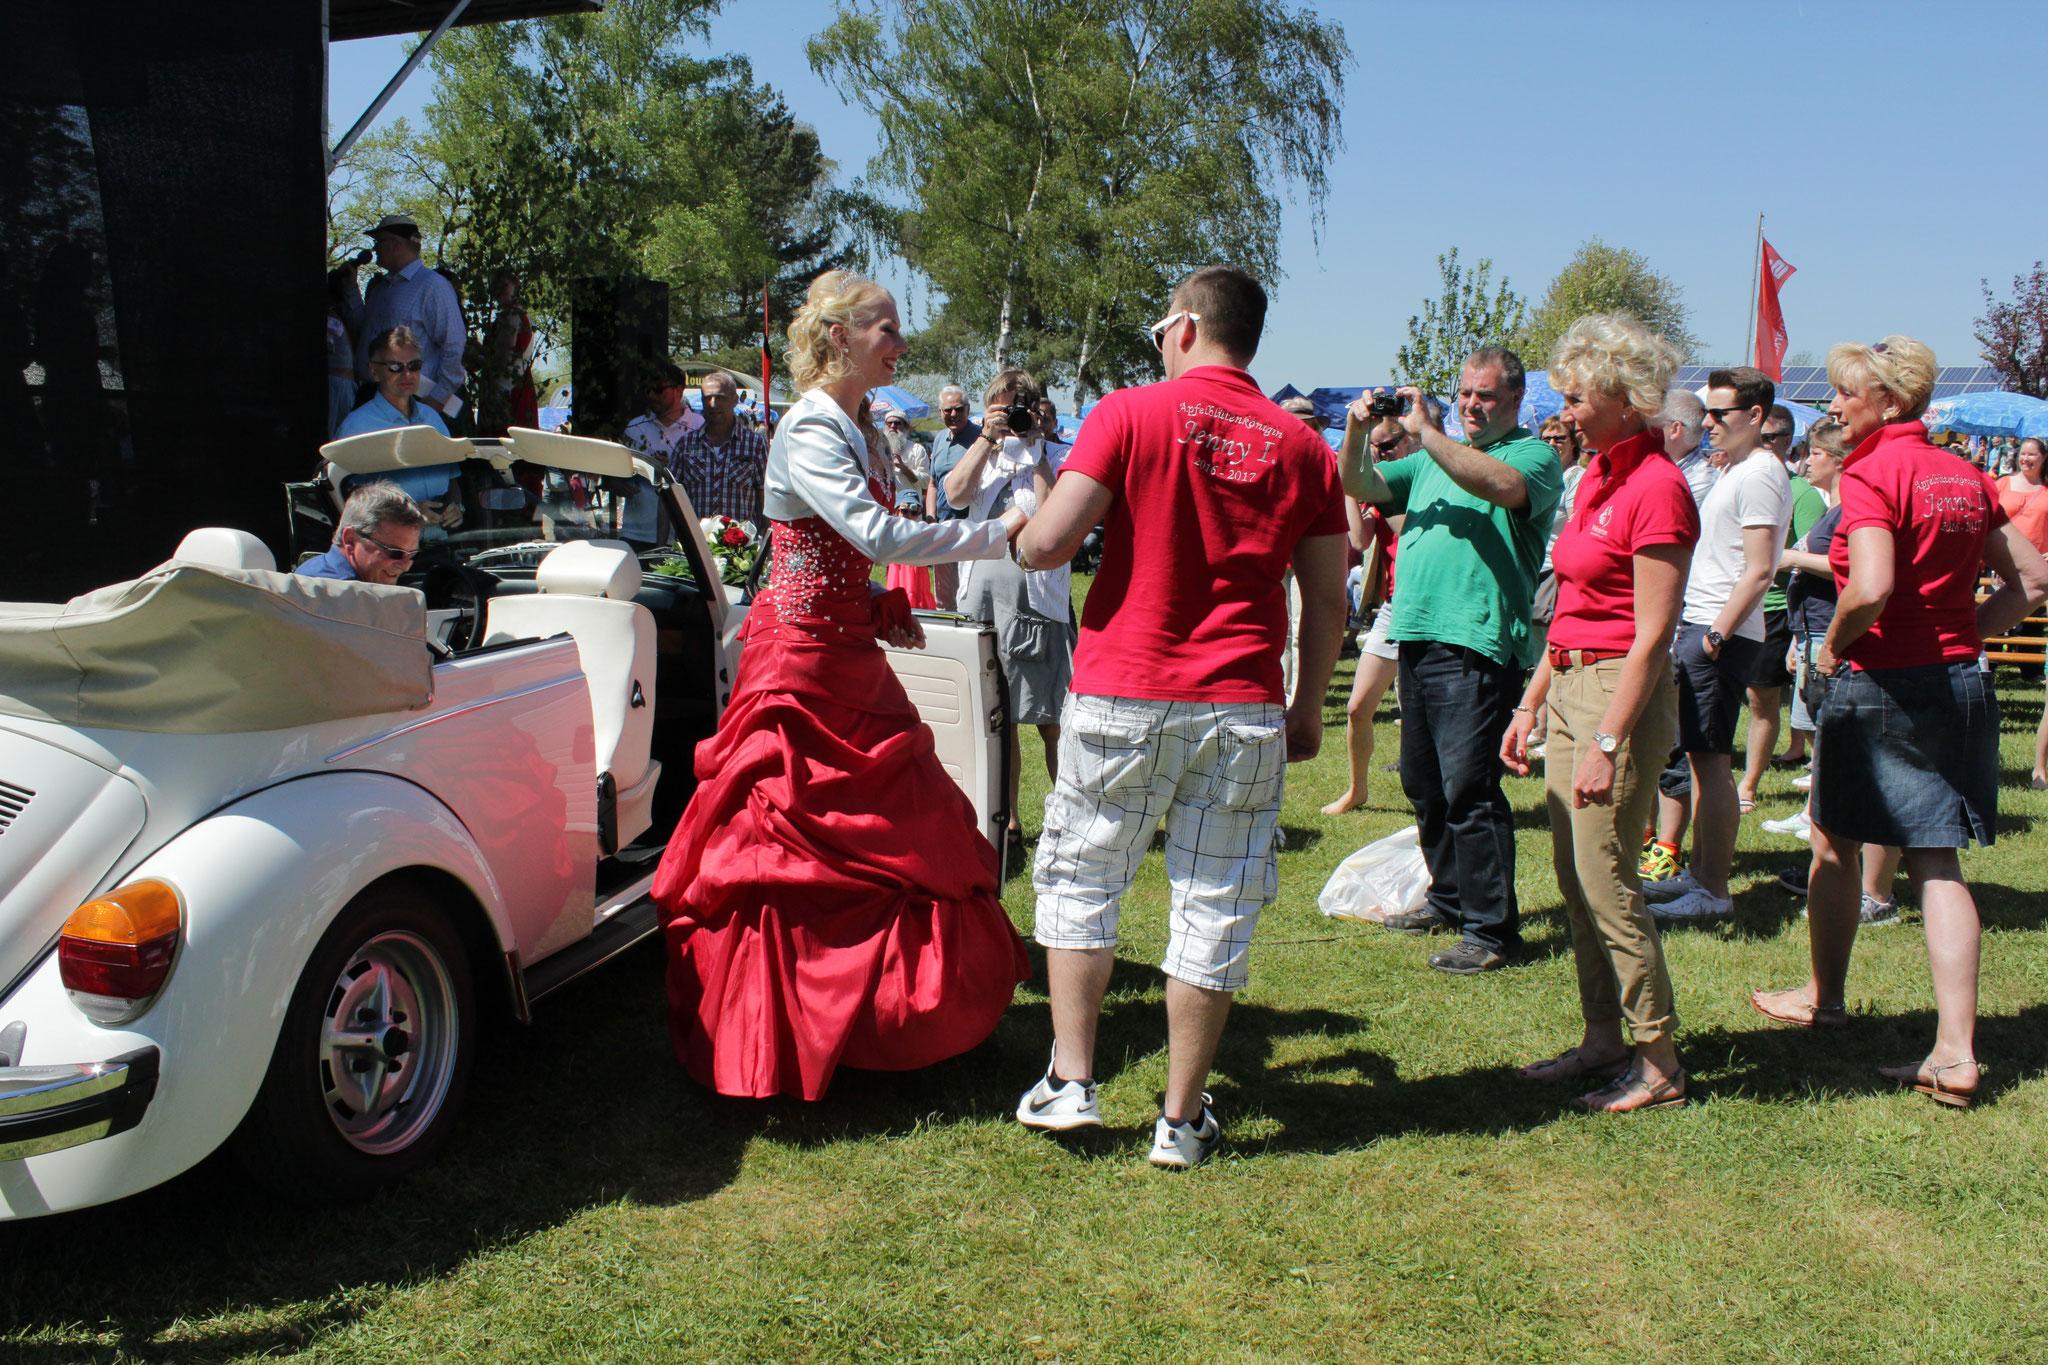 Wehrheimer Apfelblütenkönigin Jenny I. 2016/17. Foto: UKo alle Rechte vorbehalten: Ursula Konder